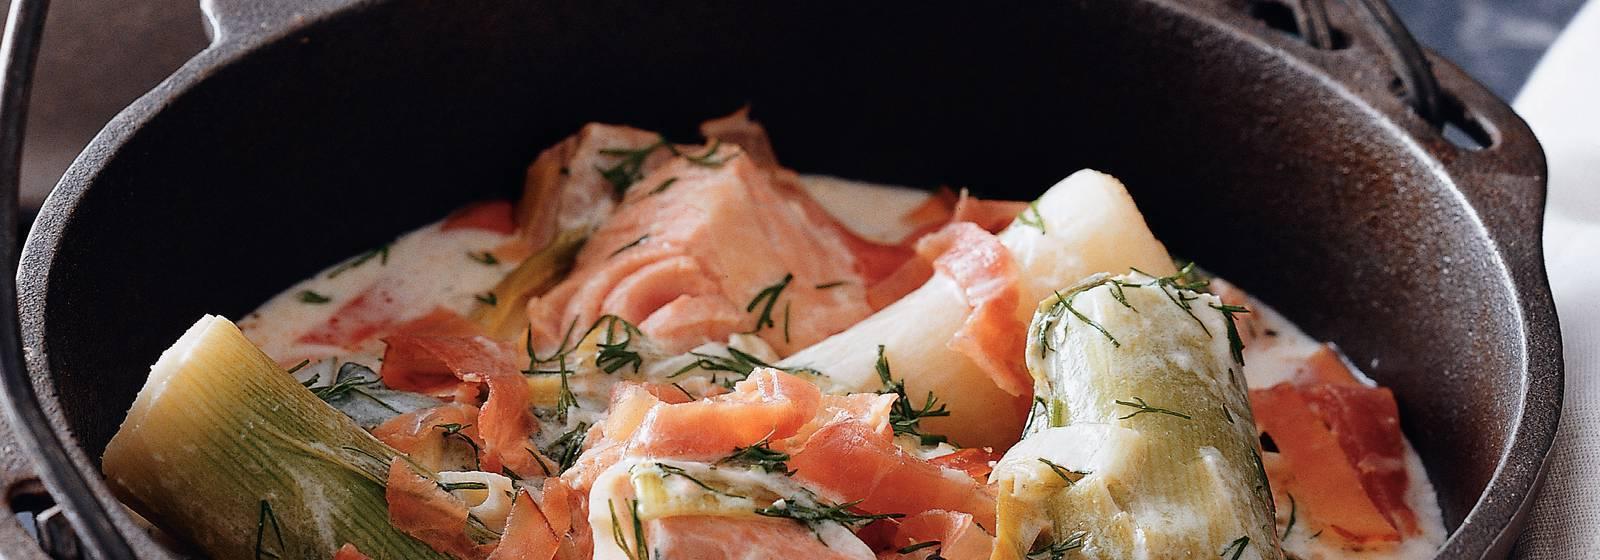 Waterzooi of salmon and leek